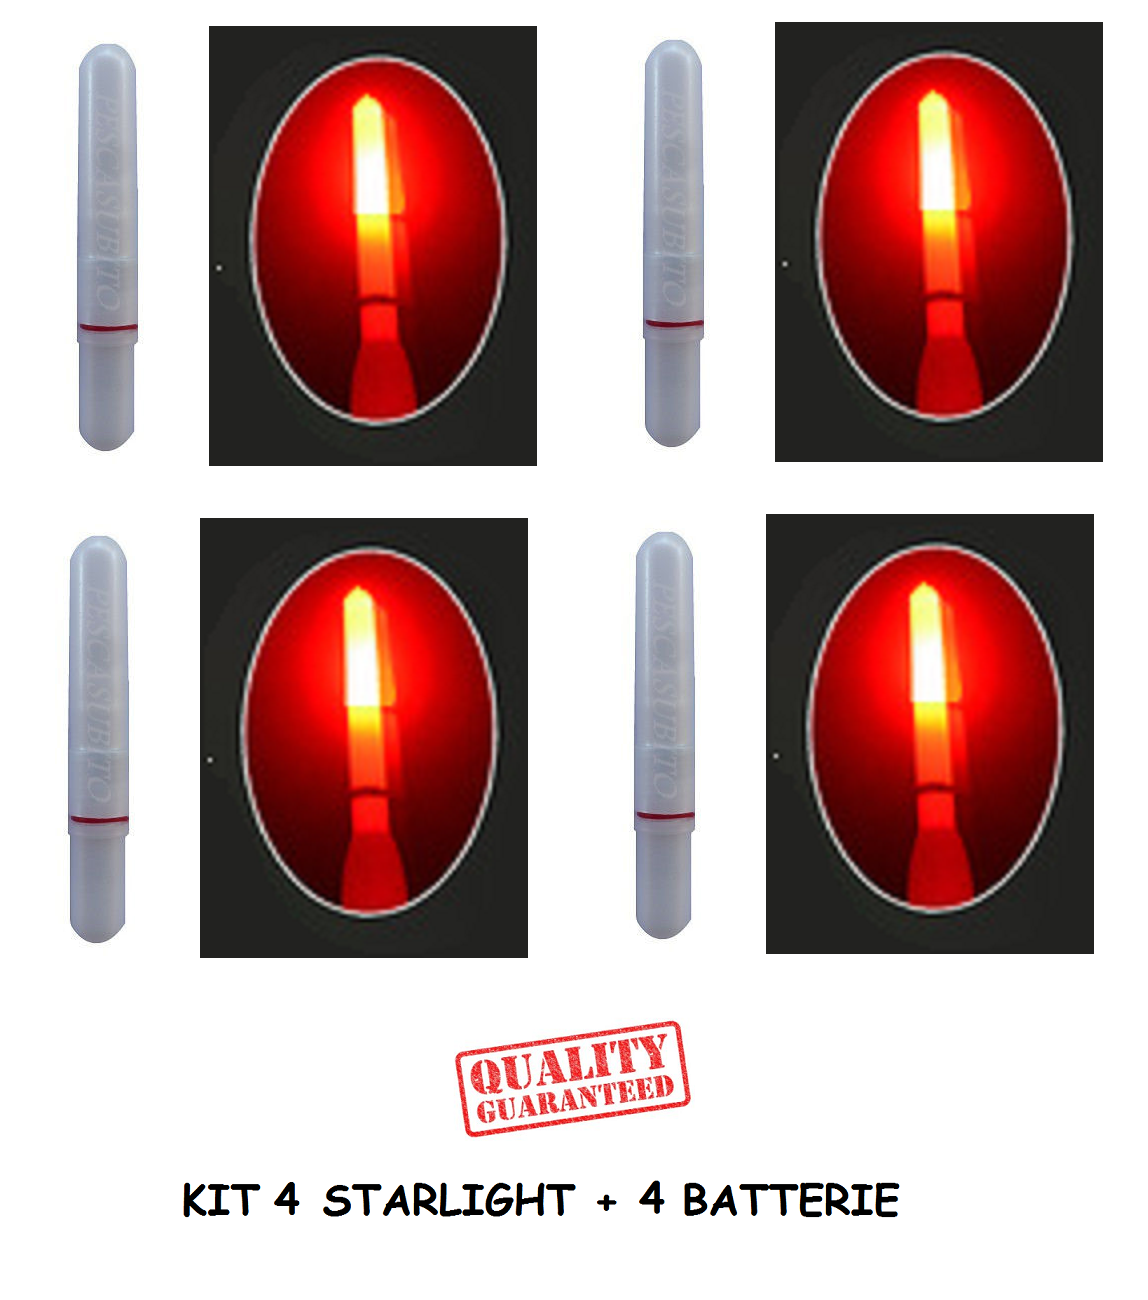 4922044 Scatola Starlight 4.5x39 2x50pz pesca x galleggiante luci notturne  PP